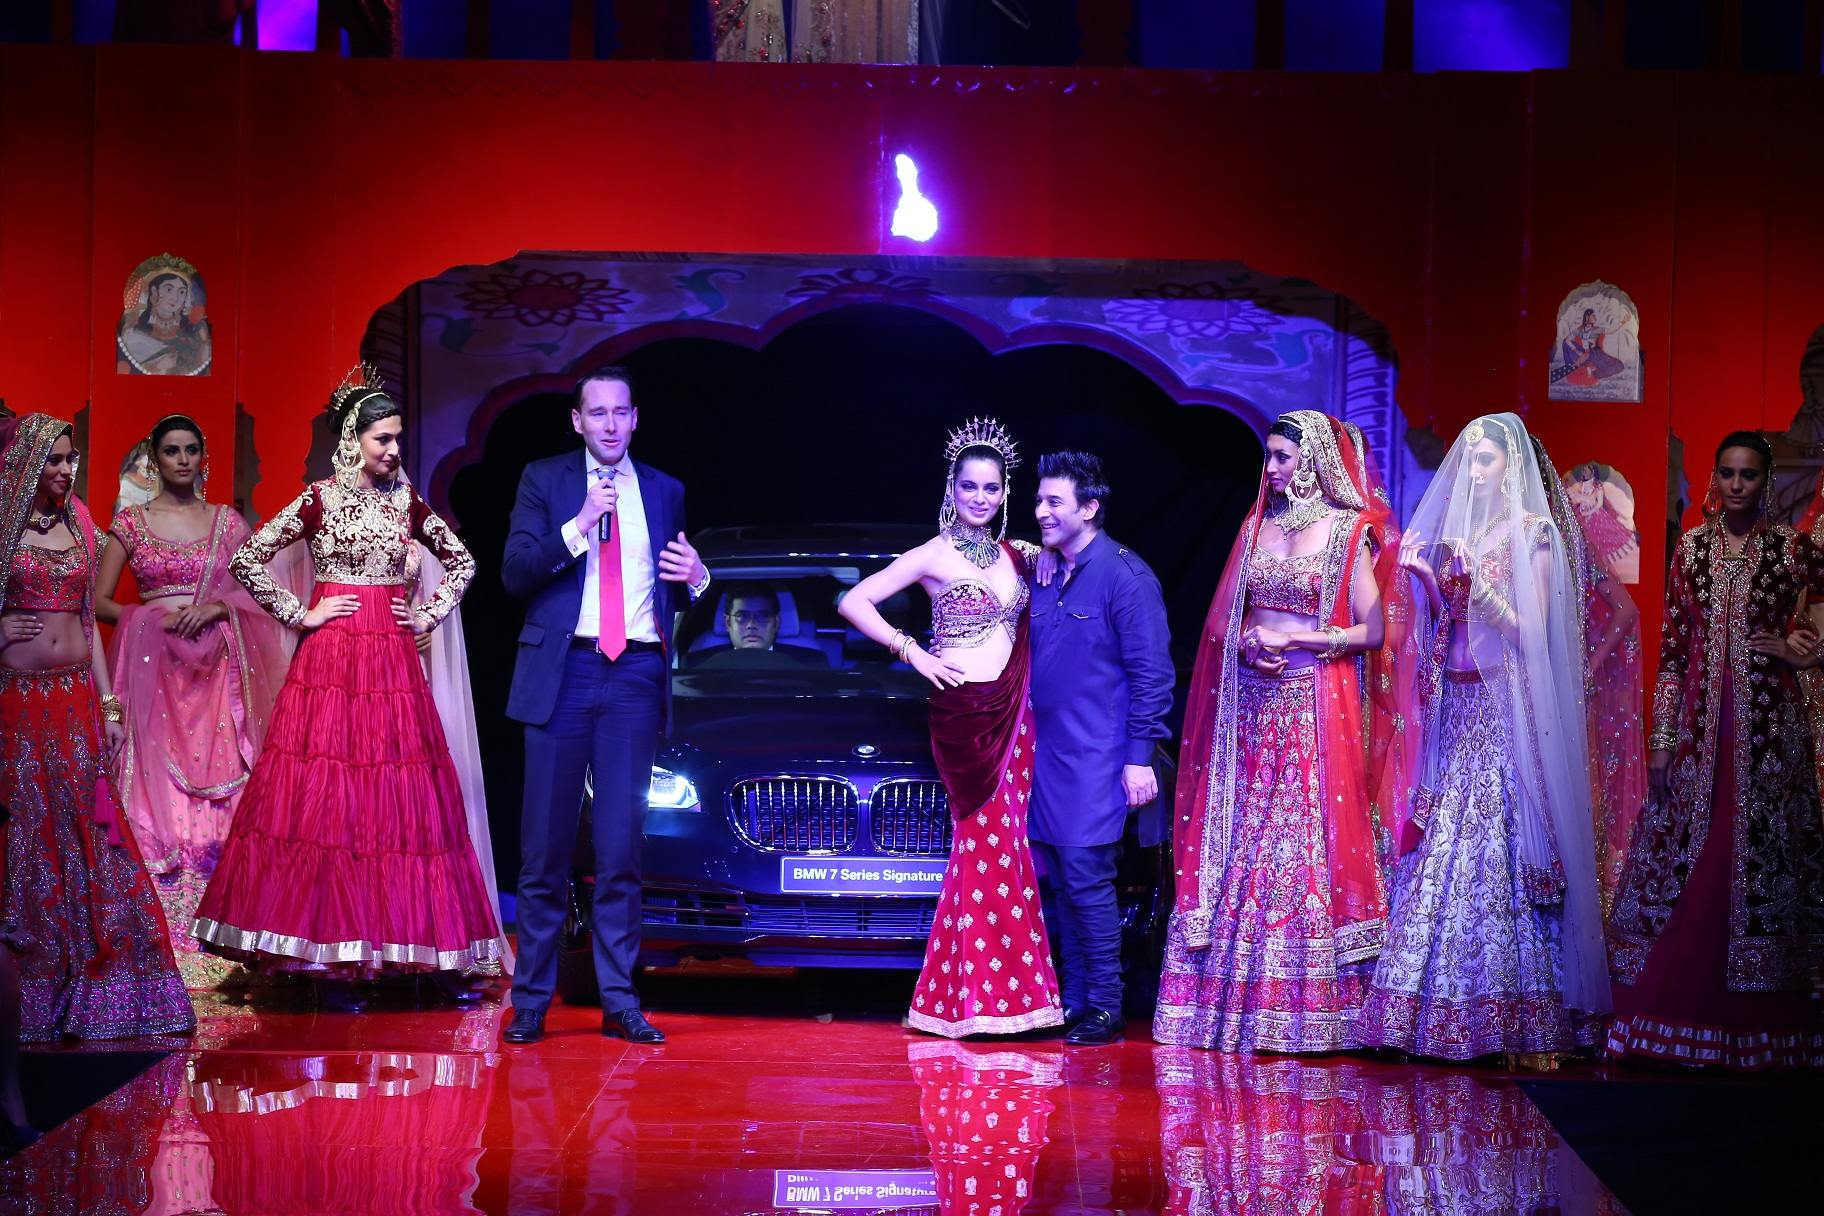 Frank Schloeder,Director Marketing BMW Group India, Kangana Ranaut and Suneet Varma at BMW India Bridal Fashion Week 2014 in association with AZVA at DLF Emporio.jpg